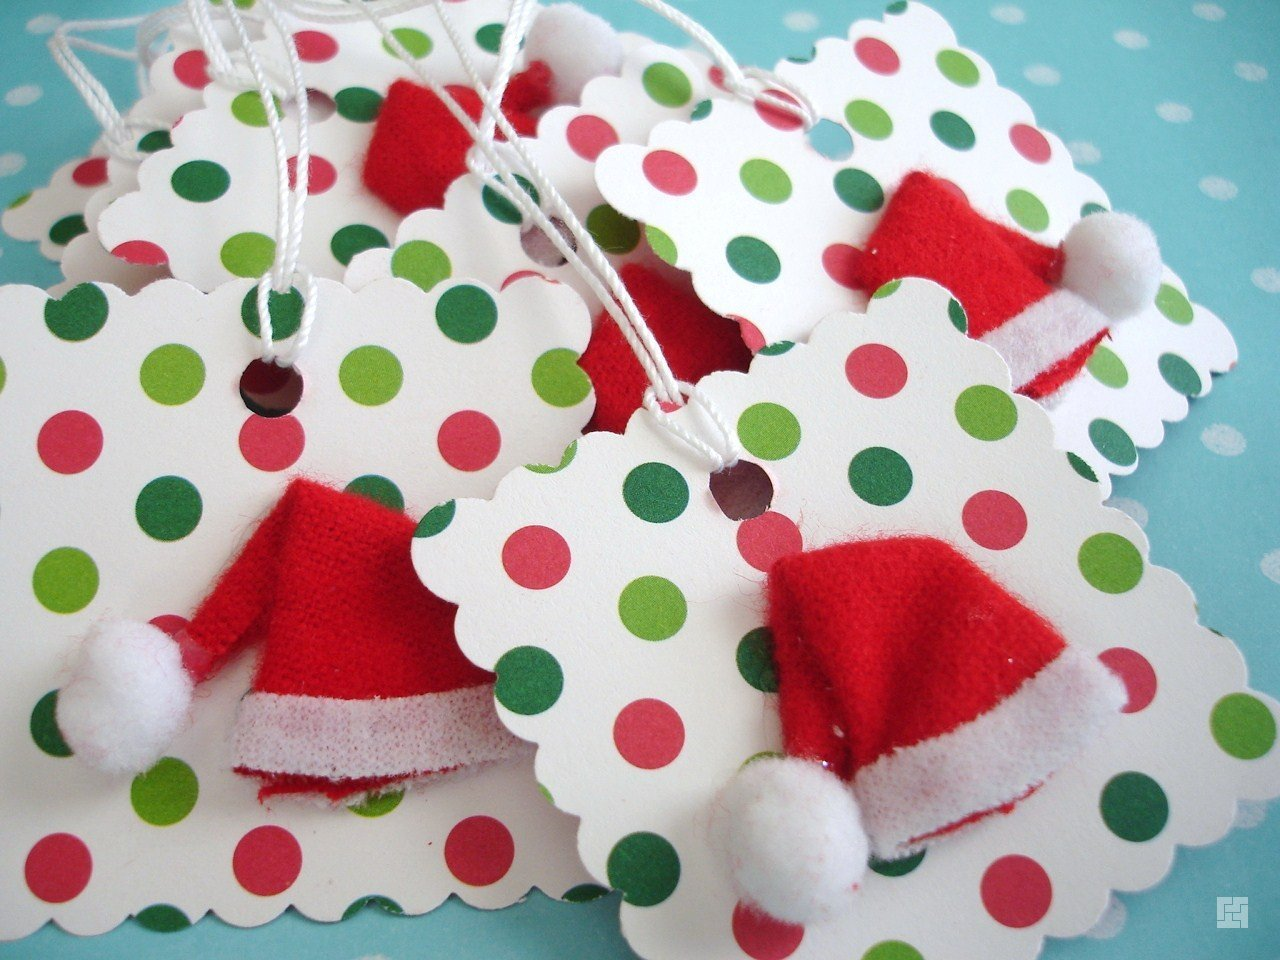 1418655730_creative-homemade-christmas-crafts-ideas